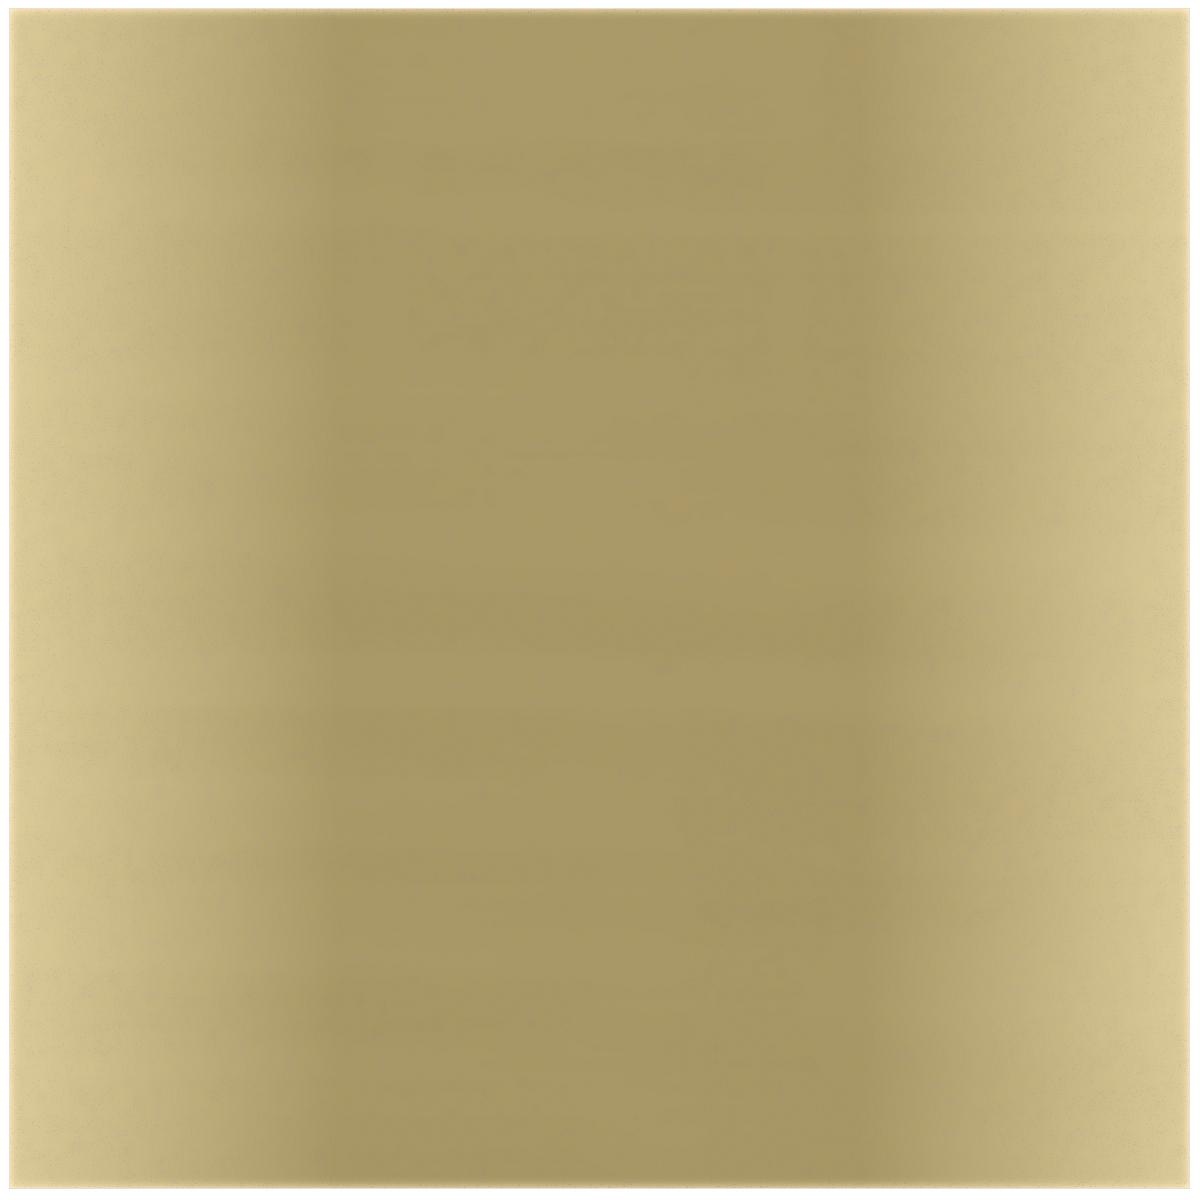 Bazzill Foil Cardstock 12X12-Gold Matte